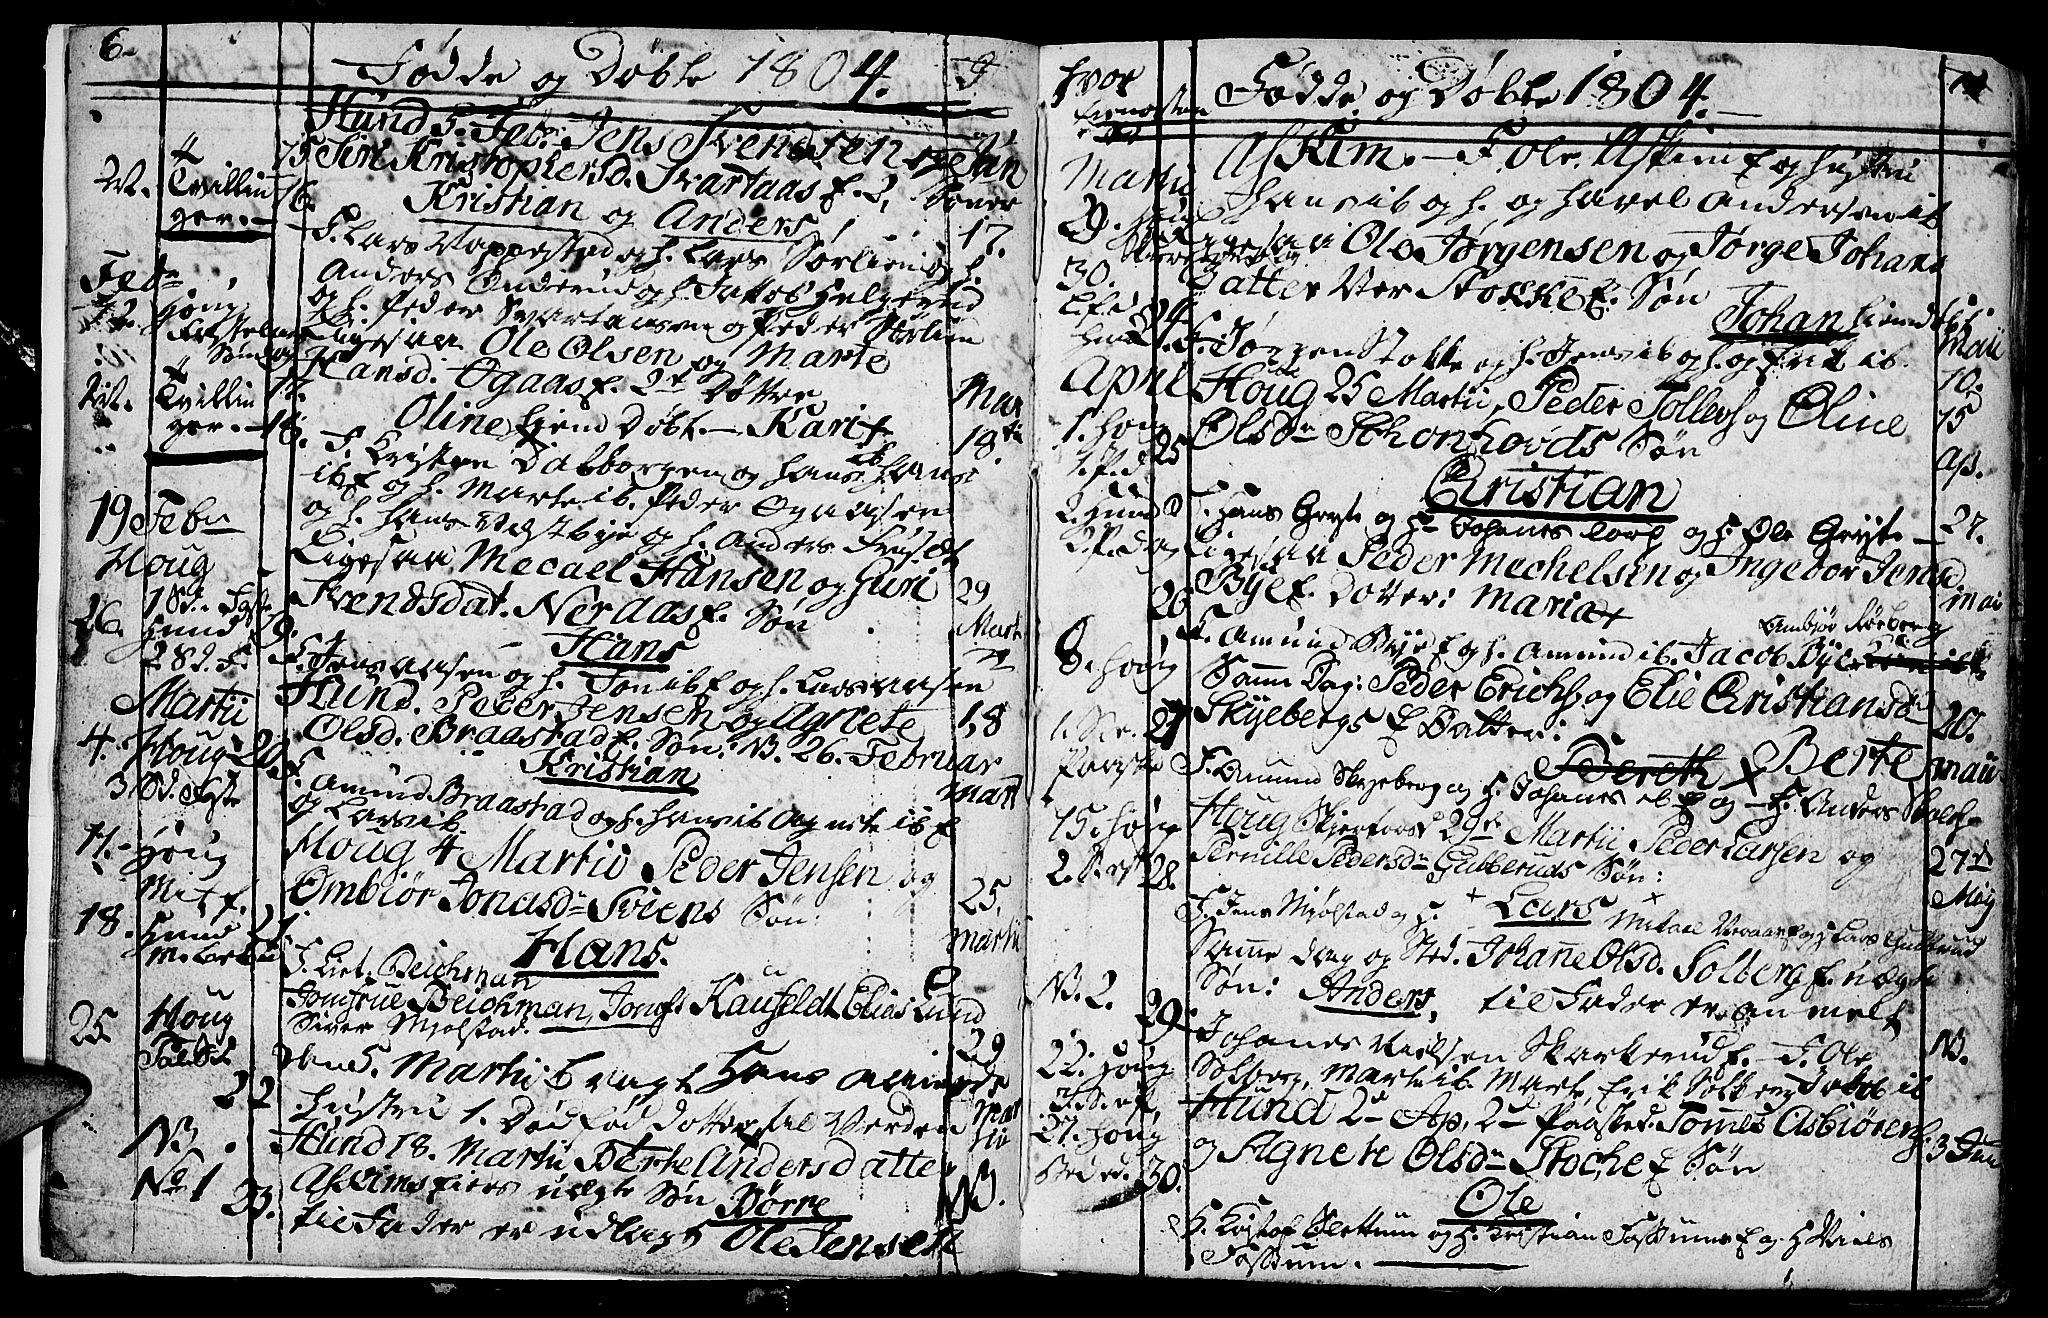 SAH, Vardal prestekontor, H/Ha/Hab/L0003: Klokkerbok nr. 3, 1803-1808, s. 6-7